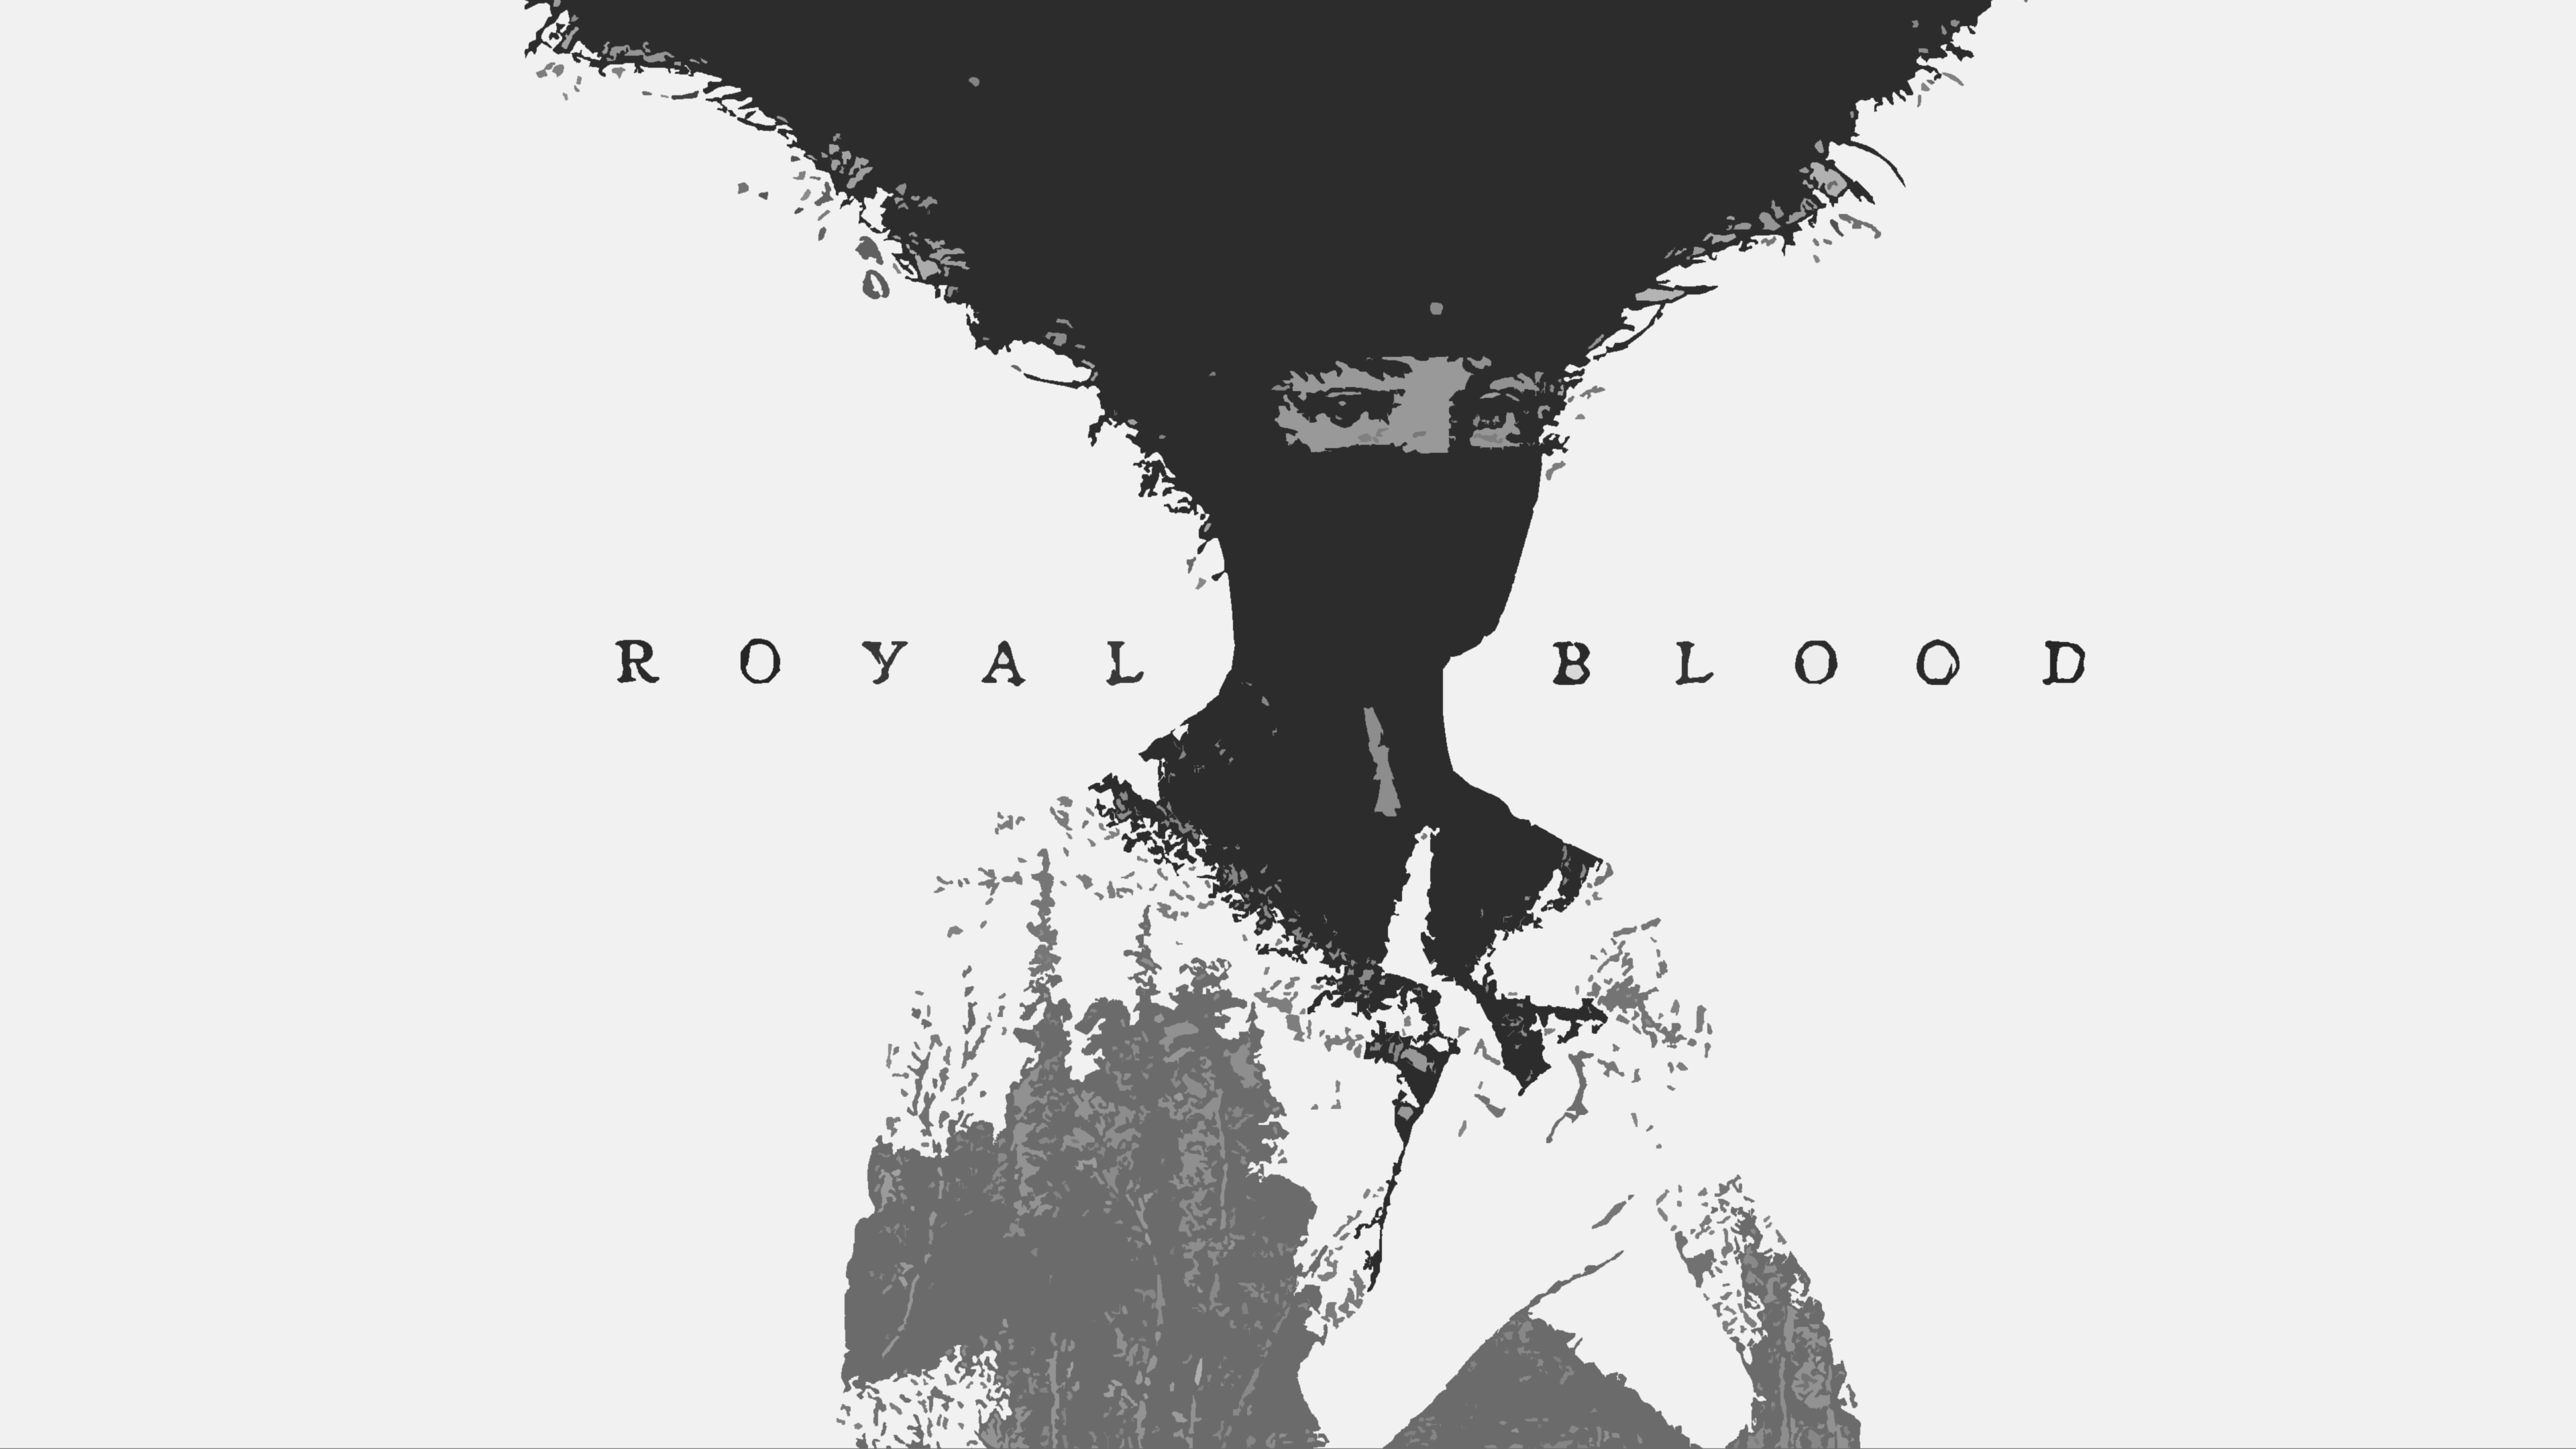 Royal Blood Wallpaper 4K by Tinajra on DeviantArt